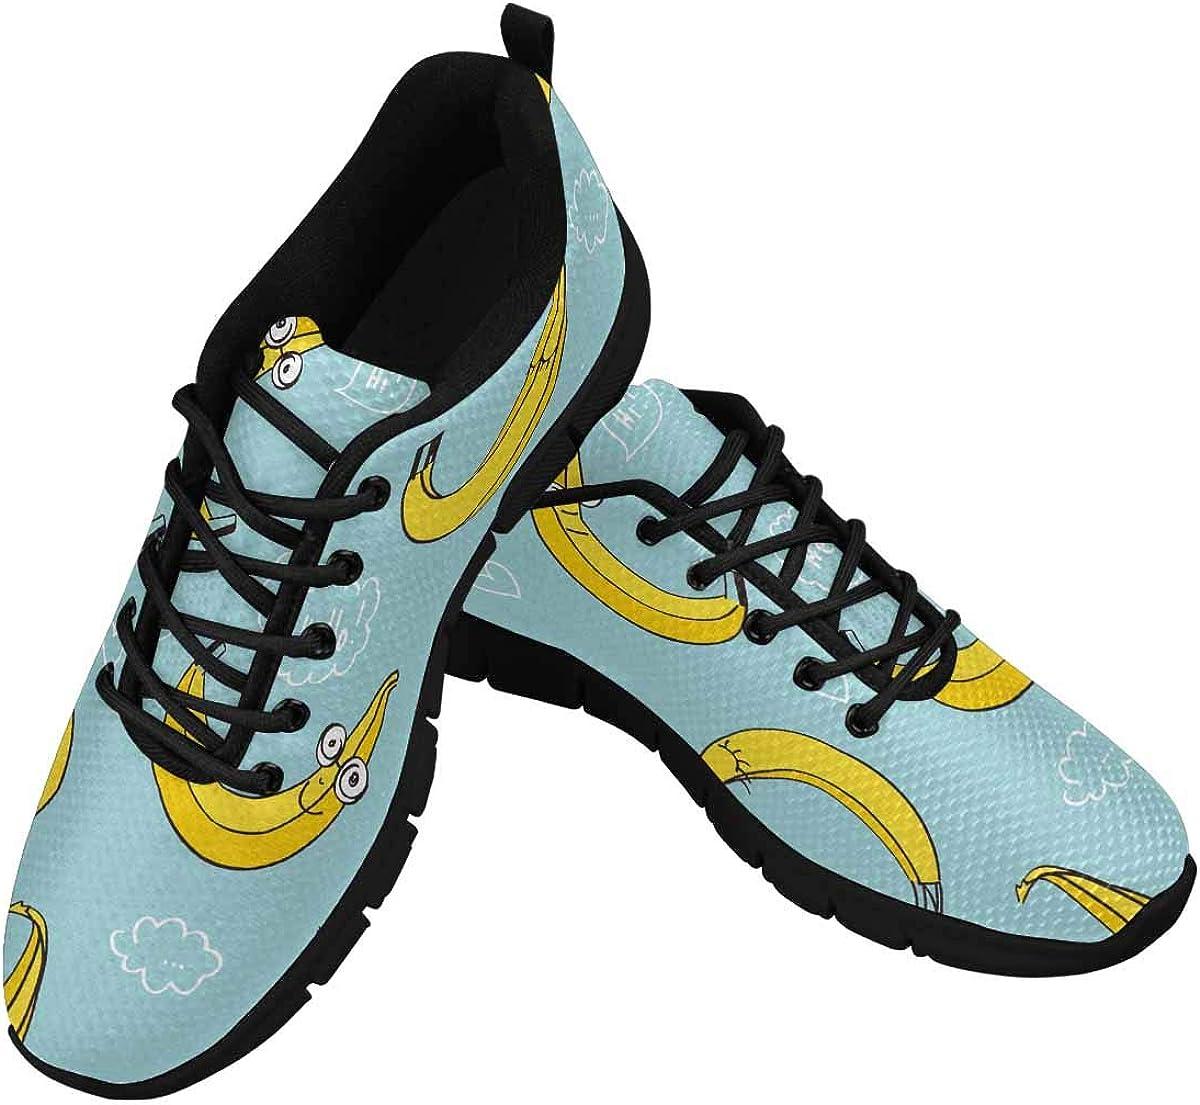 INTERESTPRINT Hand Drawn Cute Bananas Women's Athletic Walking Shoes Breathe Comfort Mesh